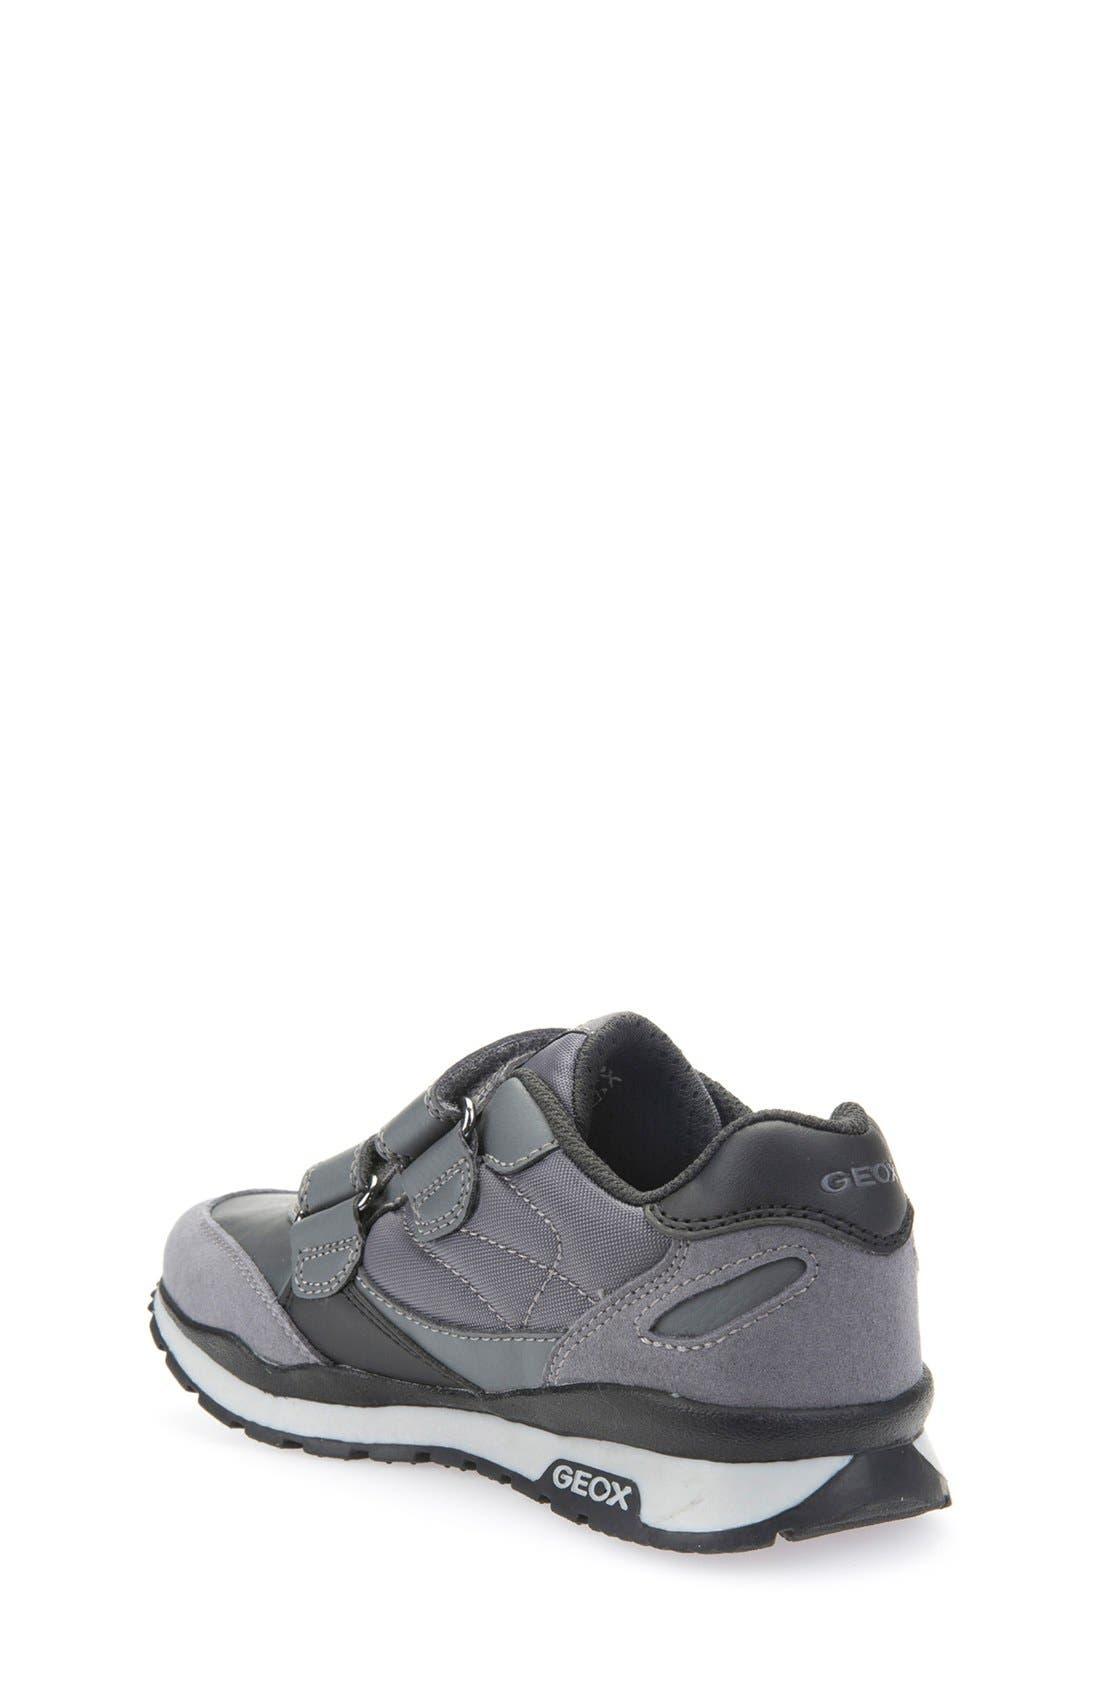 Pavel Sneaker,                             Alternate thumbnail 2, color,                             Dark Grey/ Black